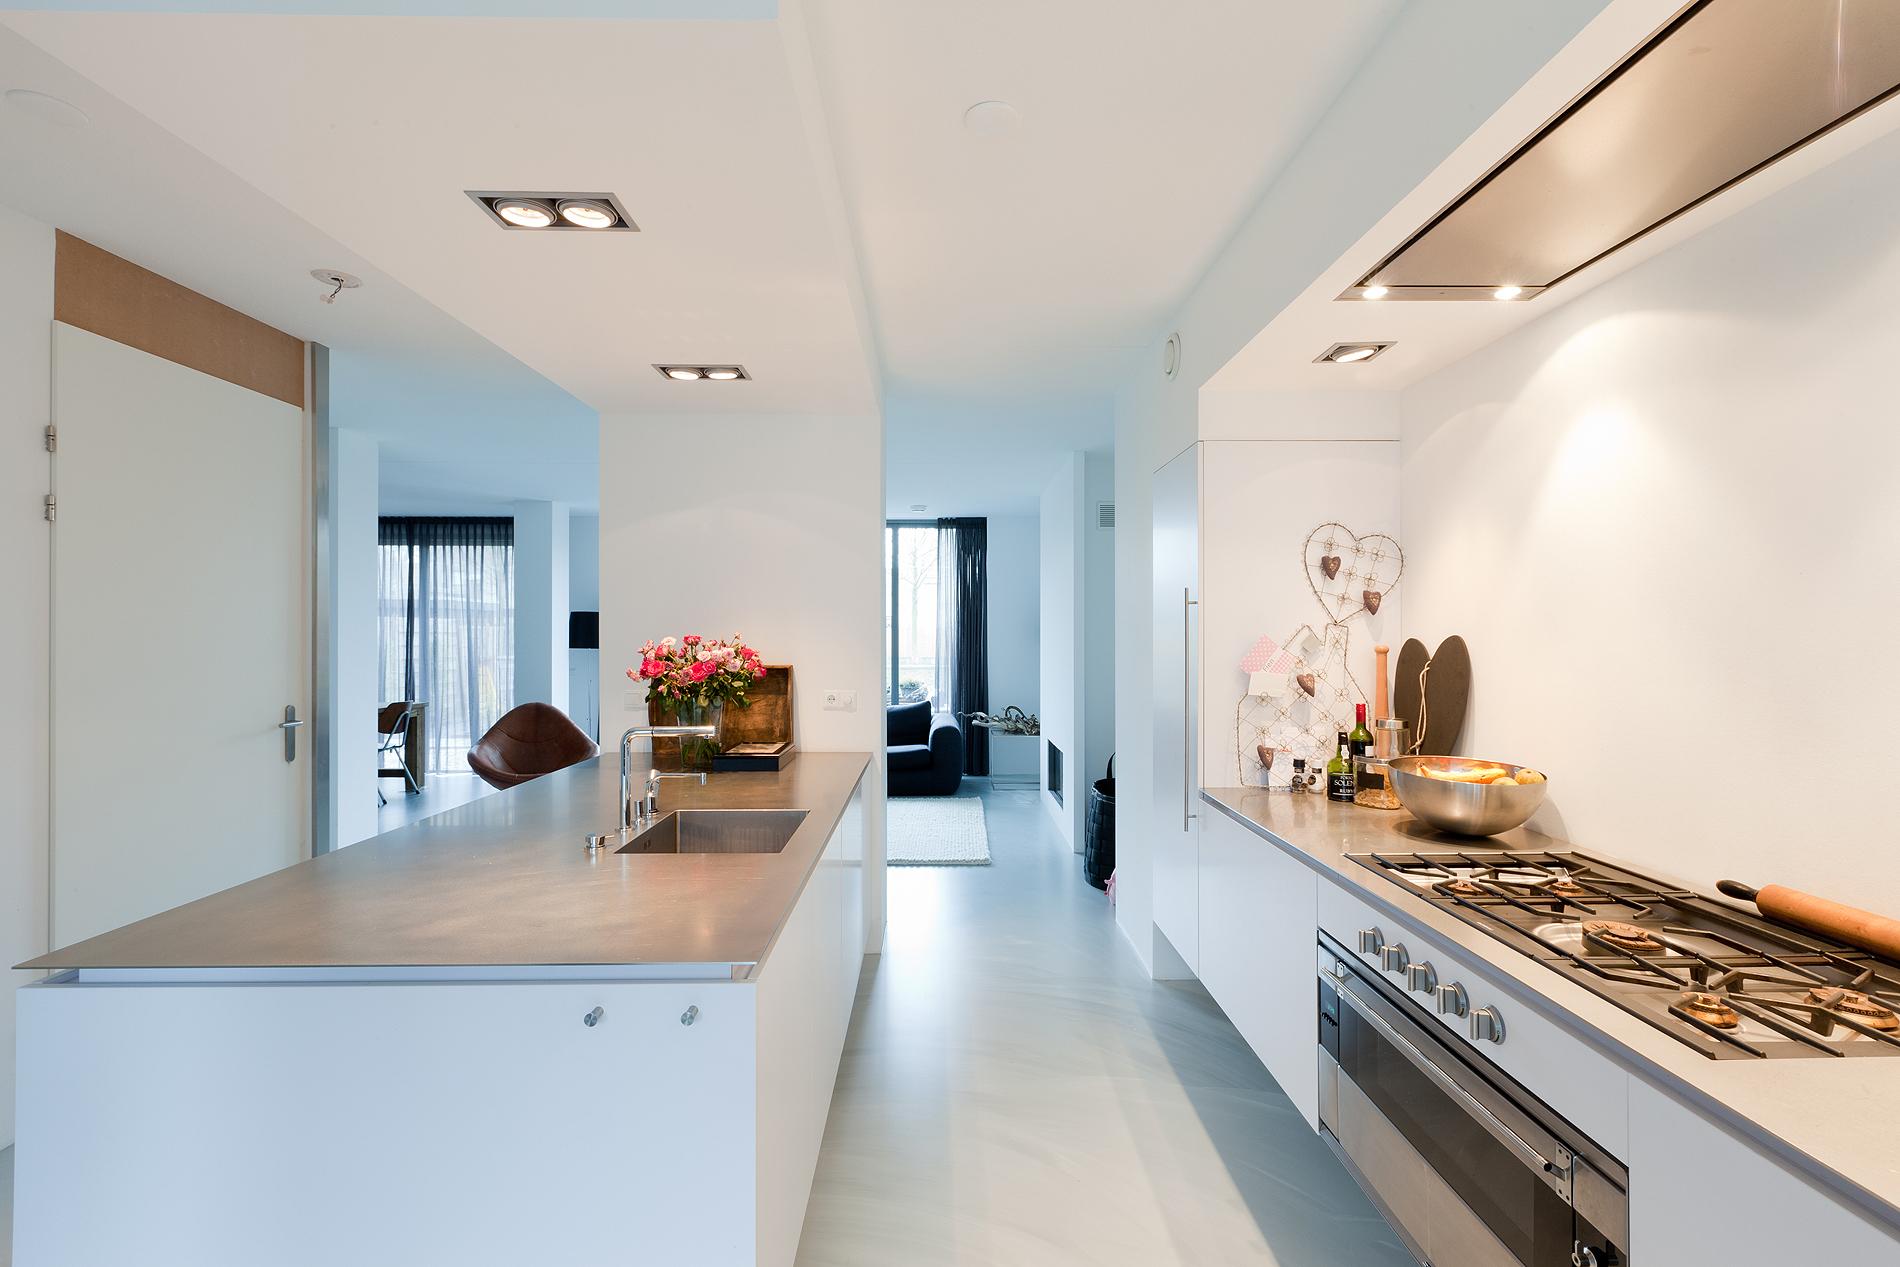 Keukens Zwartwit Nieuwenhuizen : Design keukens nieuwe keuken kopen? aswa keukens